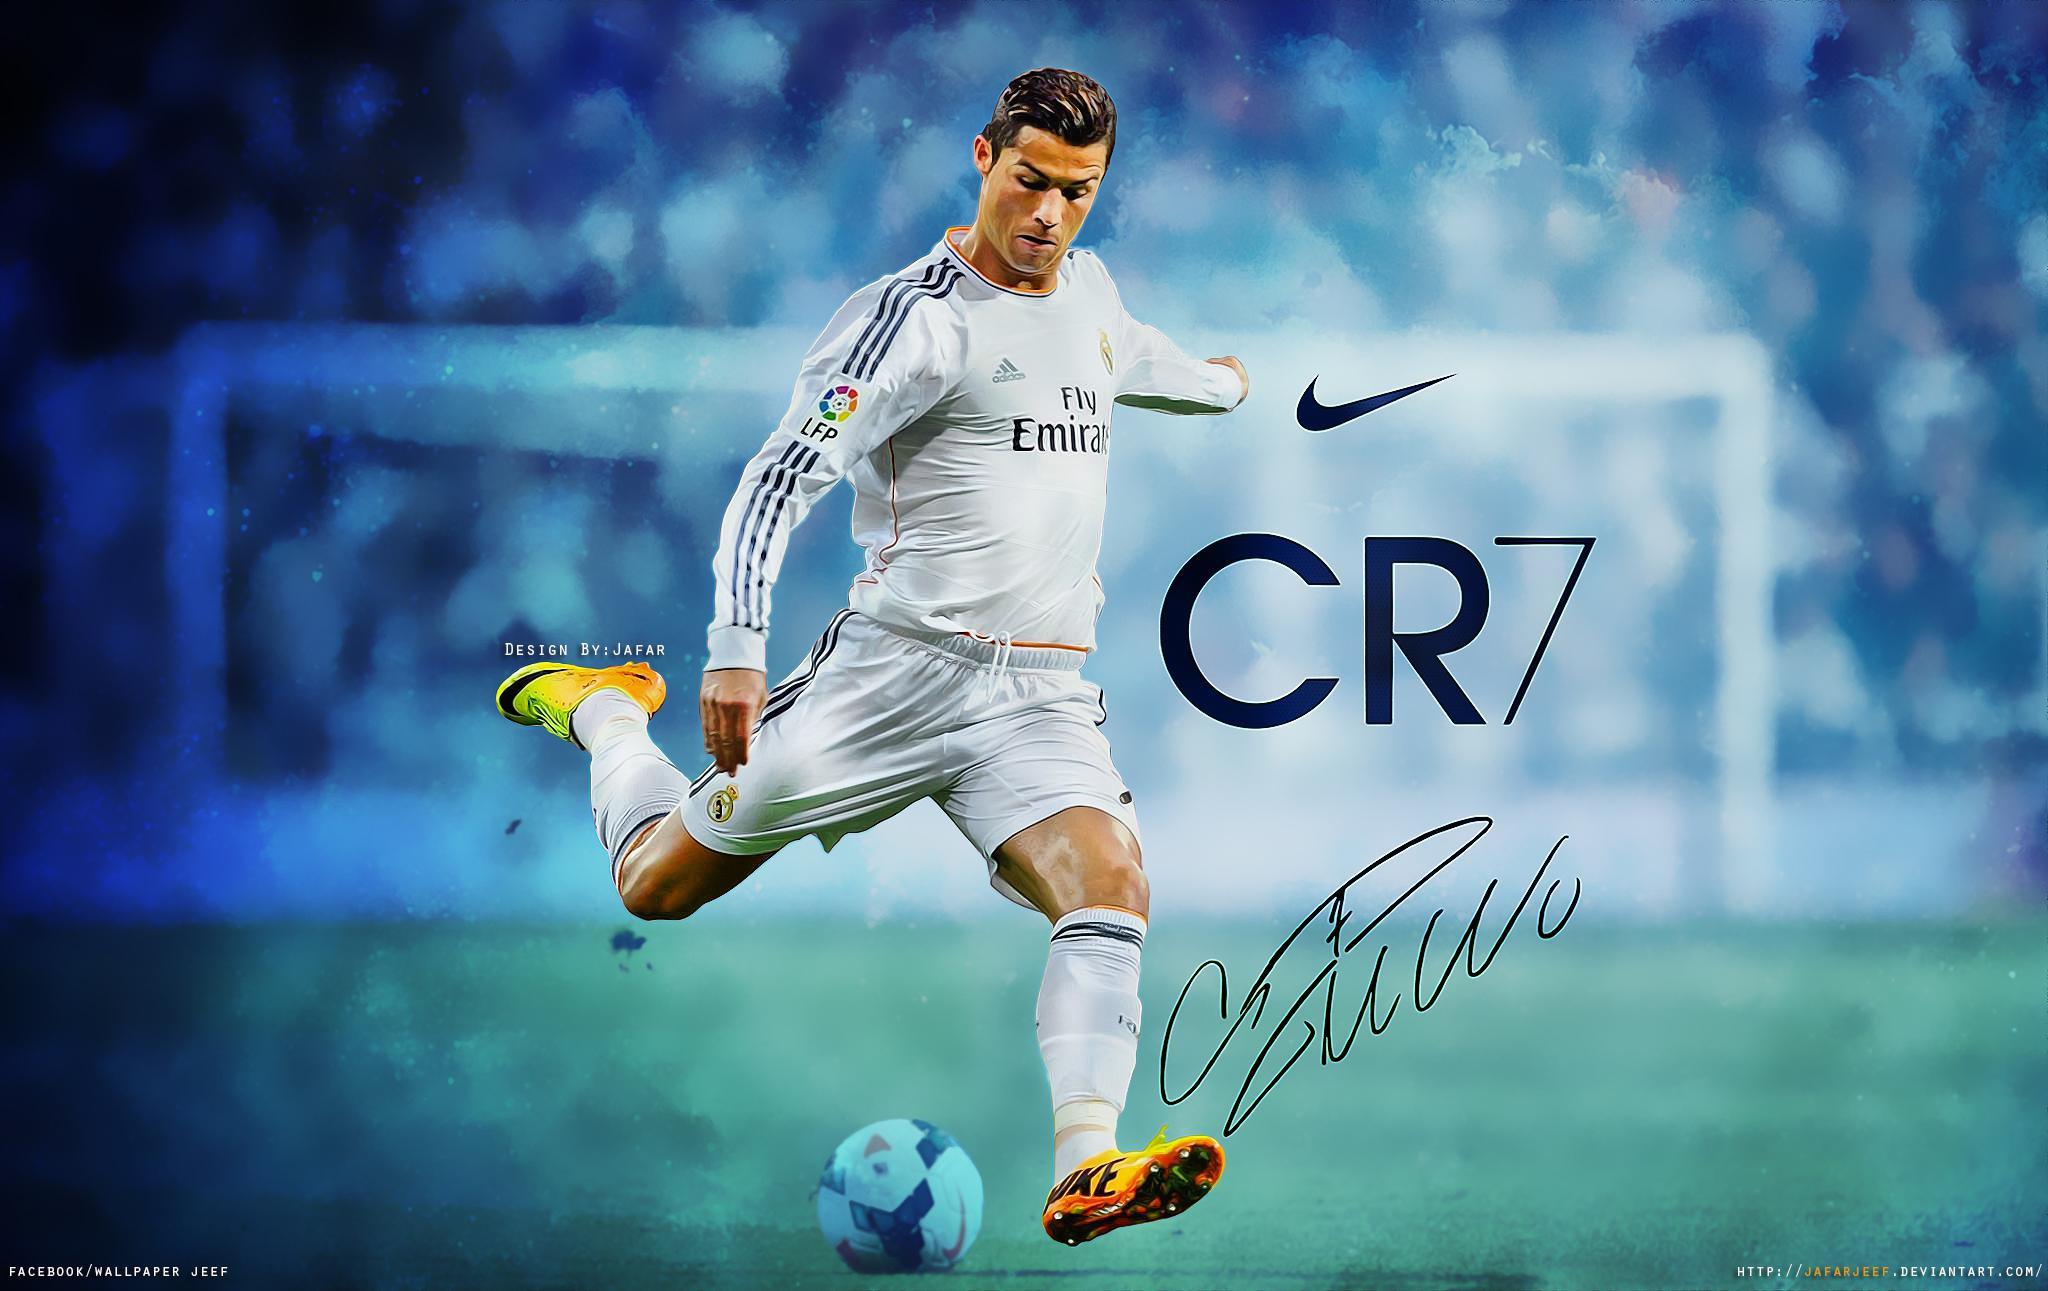 Cristiano Ronaldo wallpaper by Jafarjeef written by Cristiano Ronaldo 2048x1291